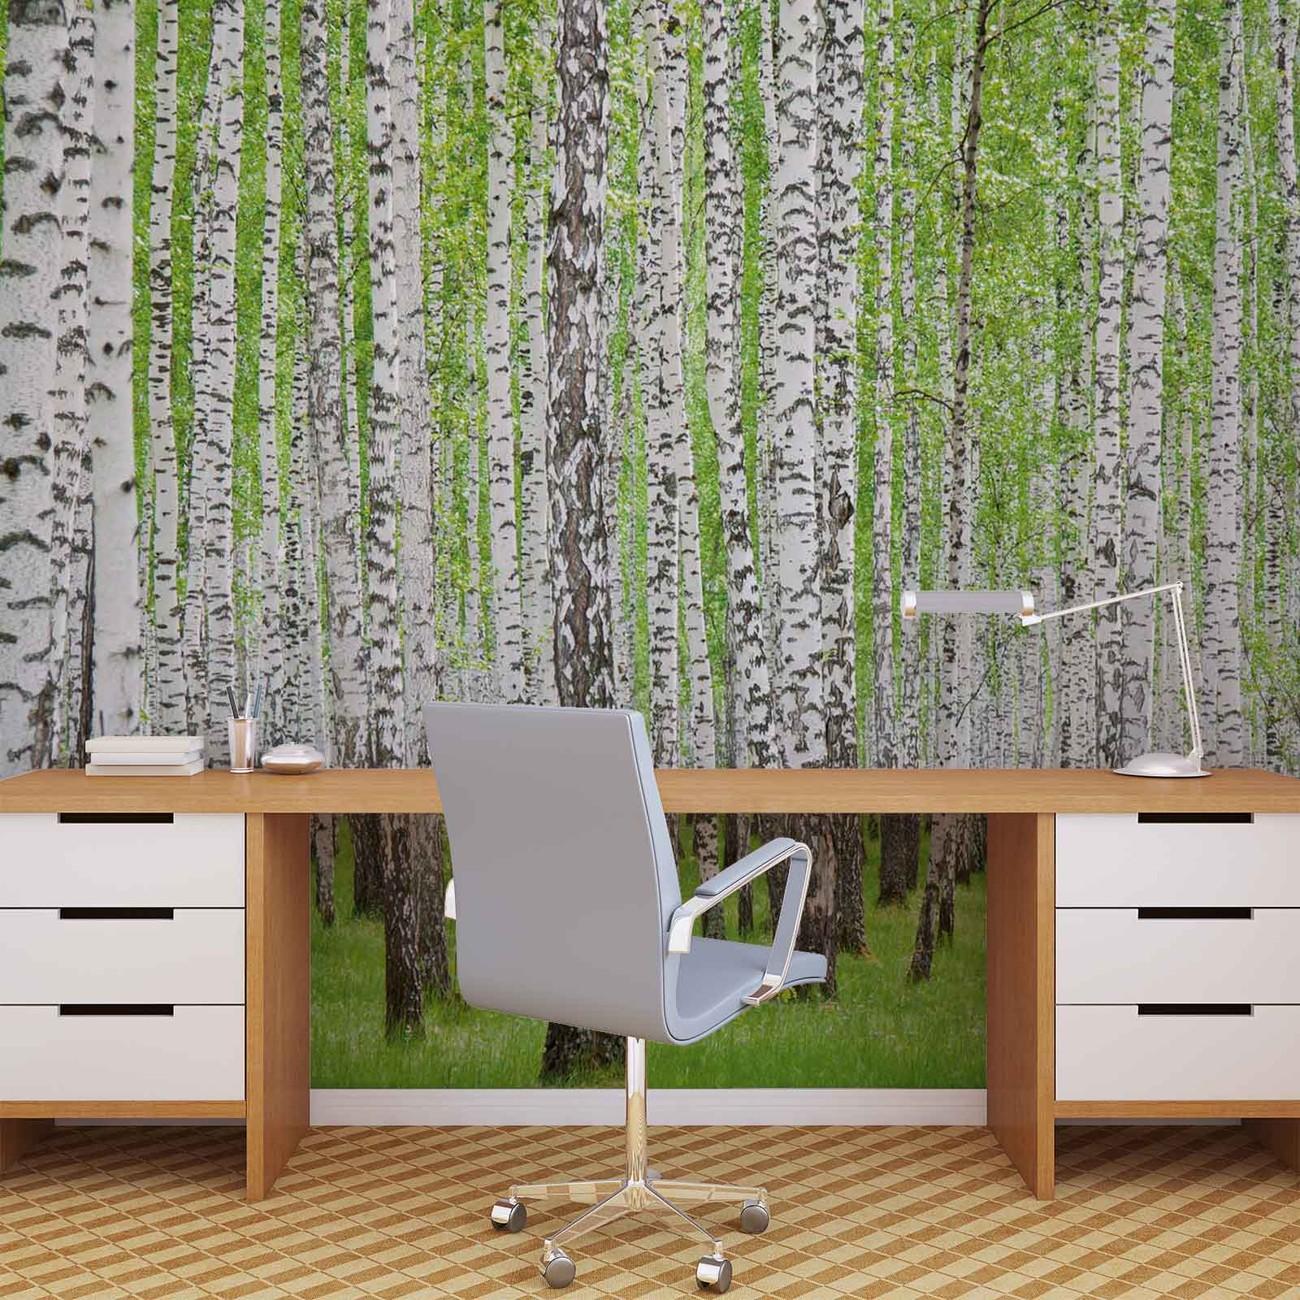 fototapete tapete wald b ume natur bei europosters kostenloser versand. Black Bedroom Furniture Sets. Home Design Ideas